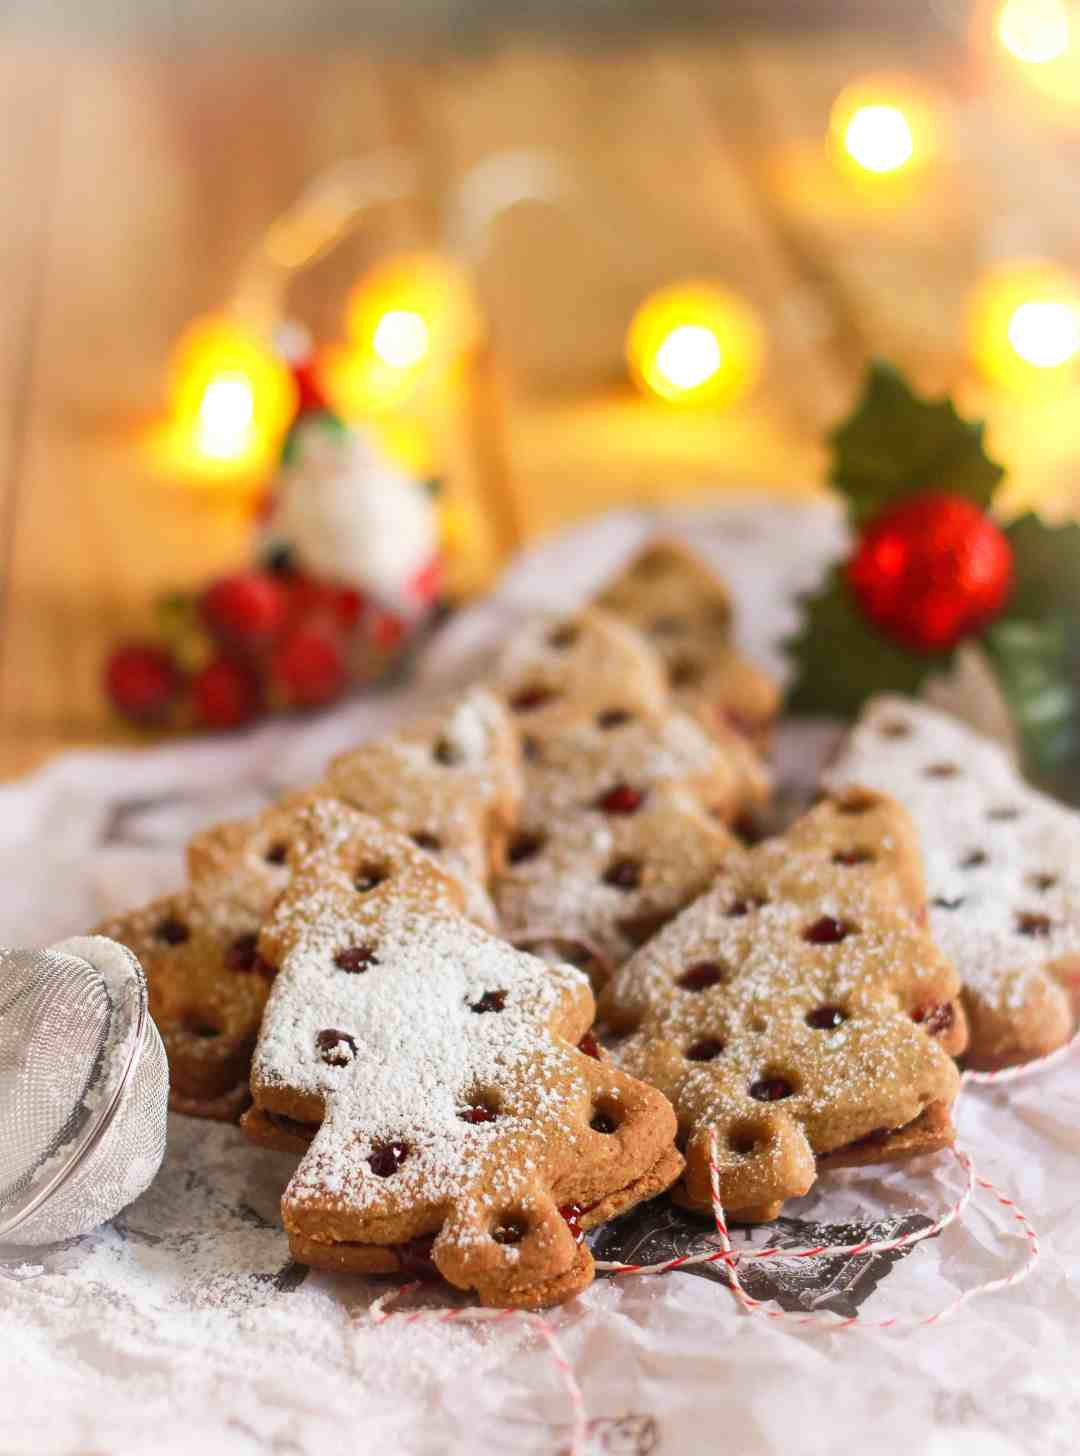 Lemon Buckwheat Linzer Cookies vegan glutenfree Christmas baking